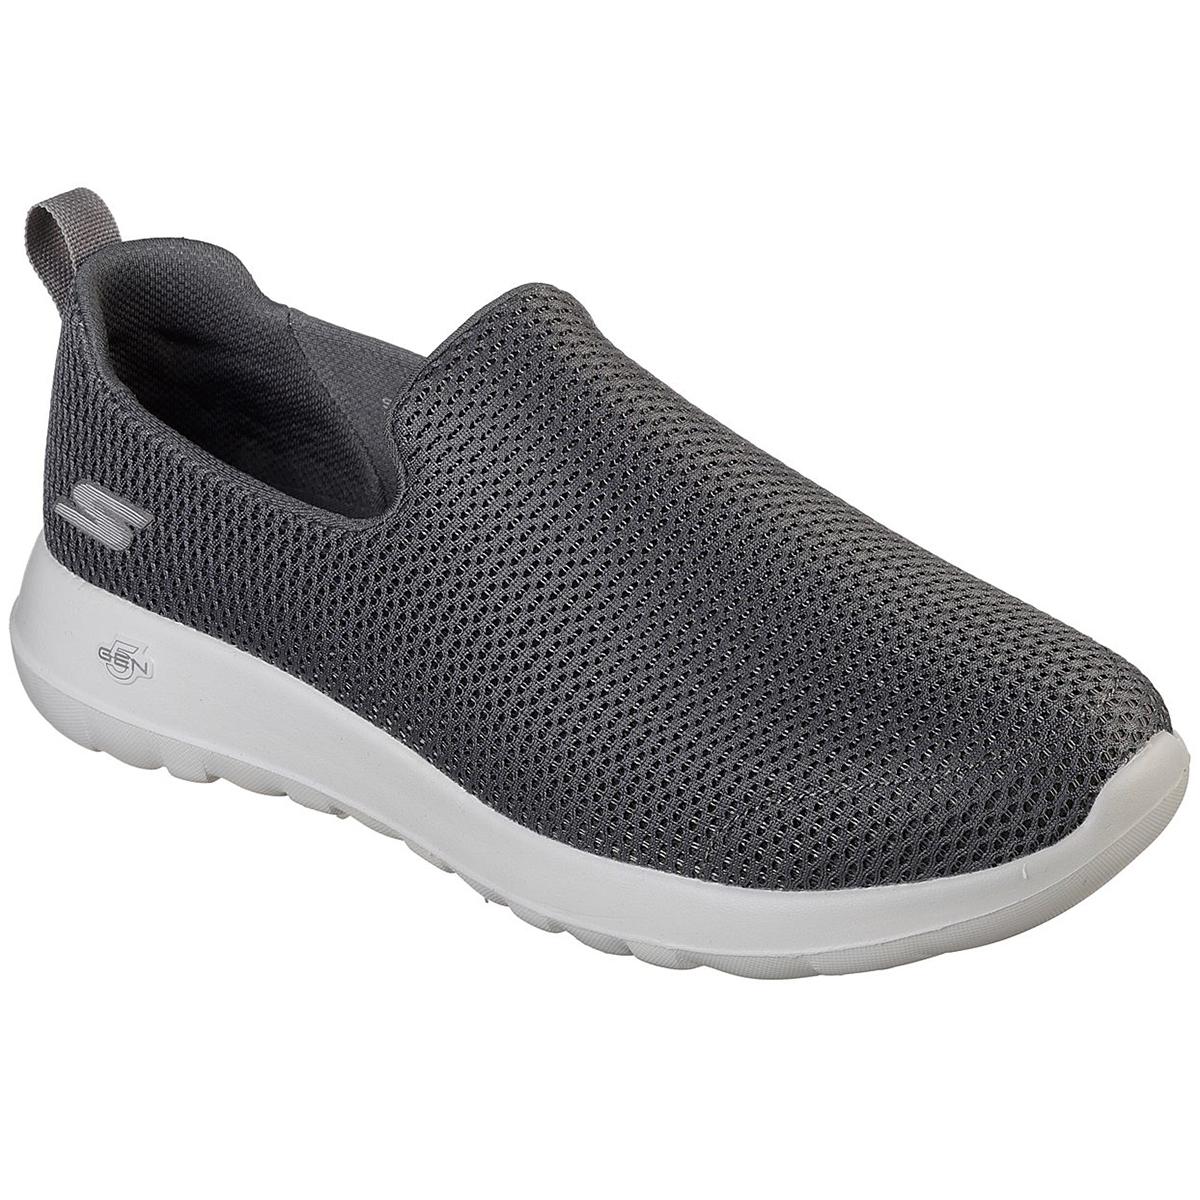 Skechers Men's Gowalk Max Casual Slip-On Shoes, Wide - Black, 9